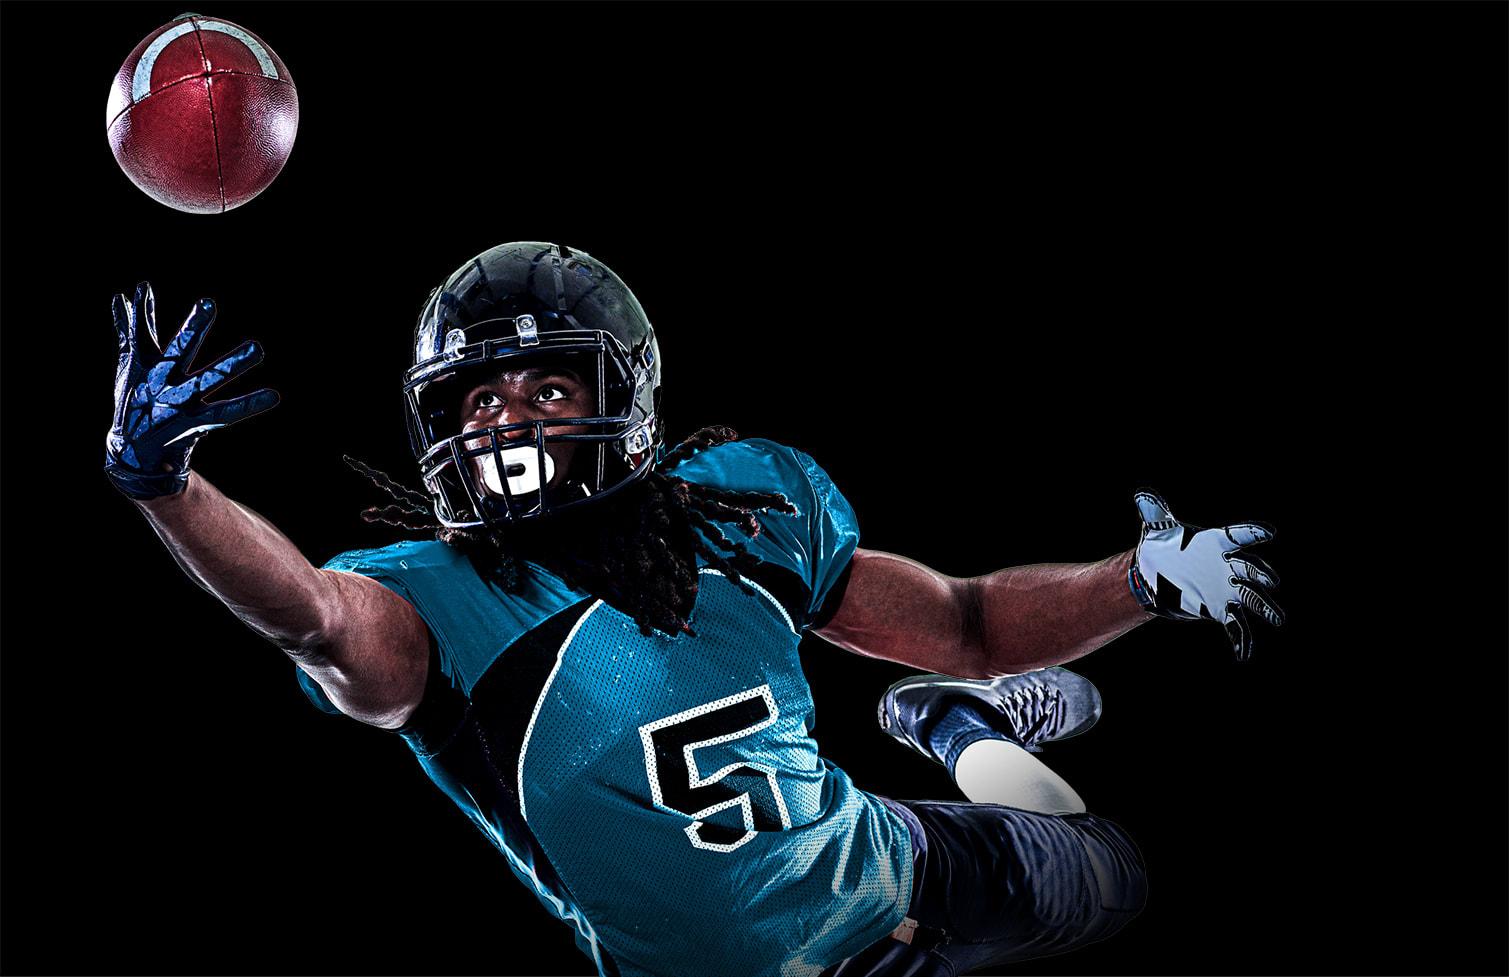 Athletes - Get Featured at Fivestar News